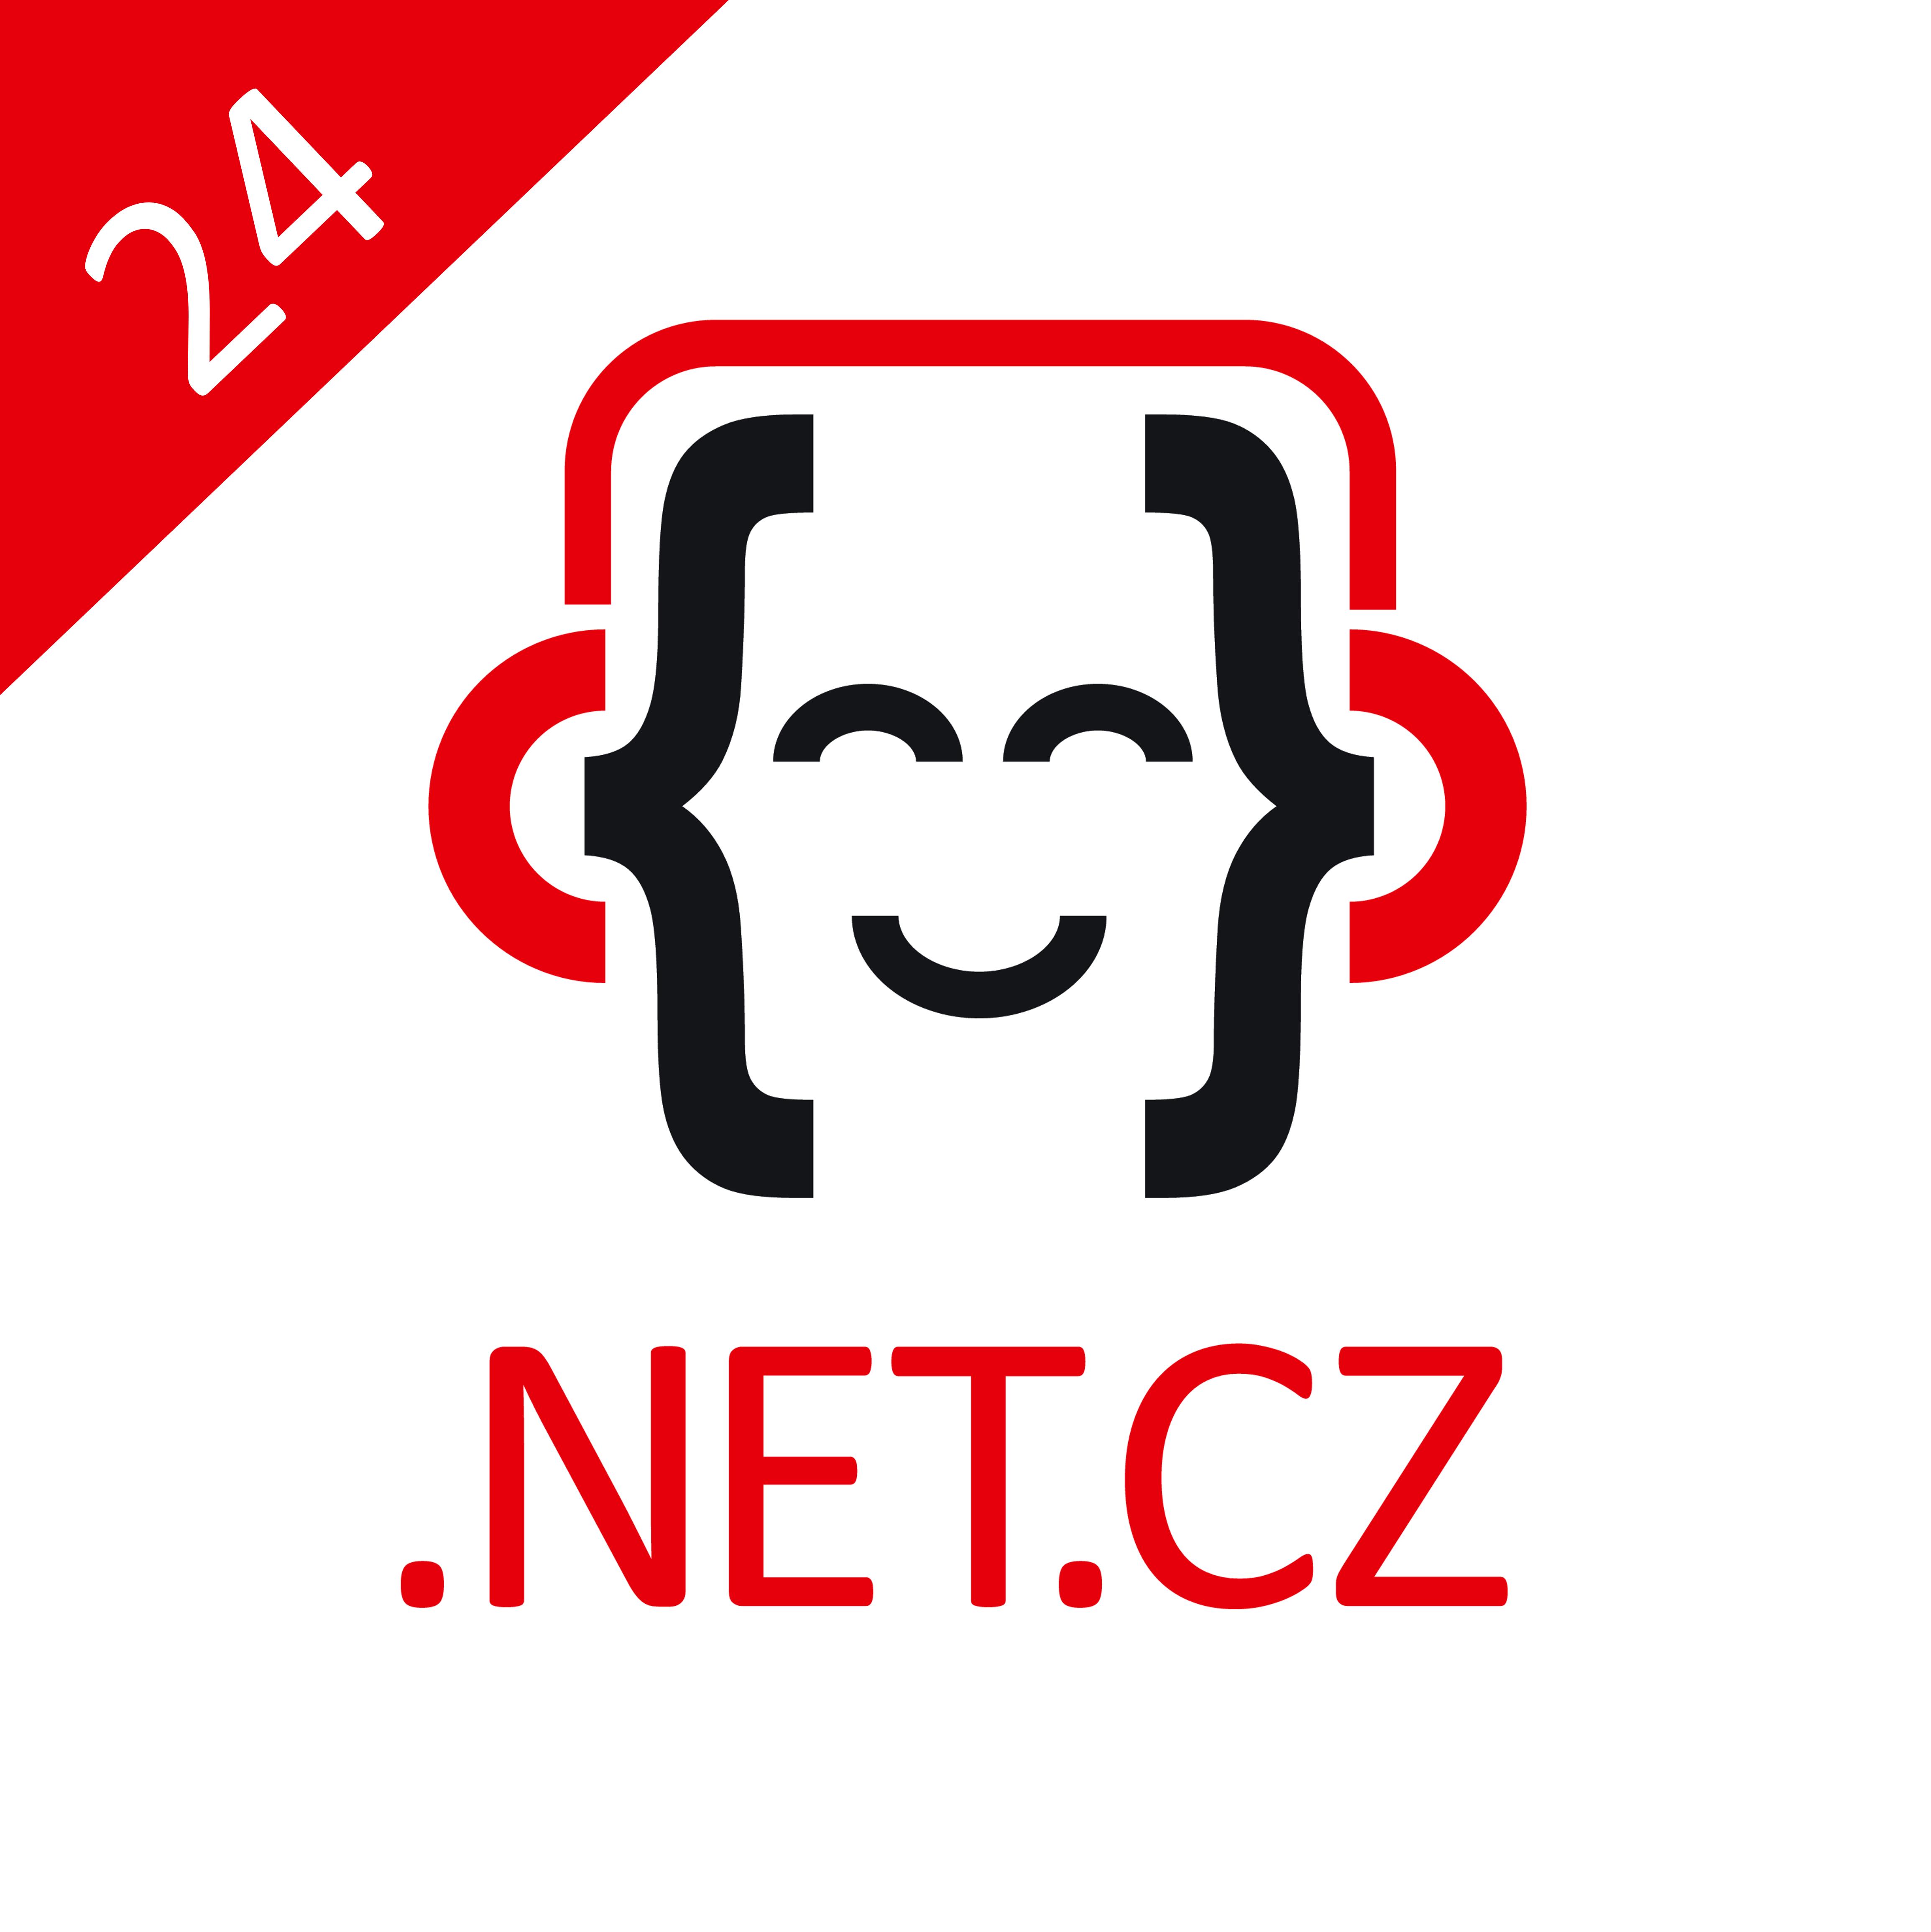 .NET.CZ(Episode.24) - Entity Framework